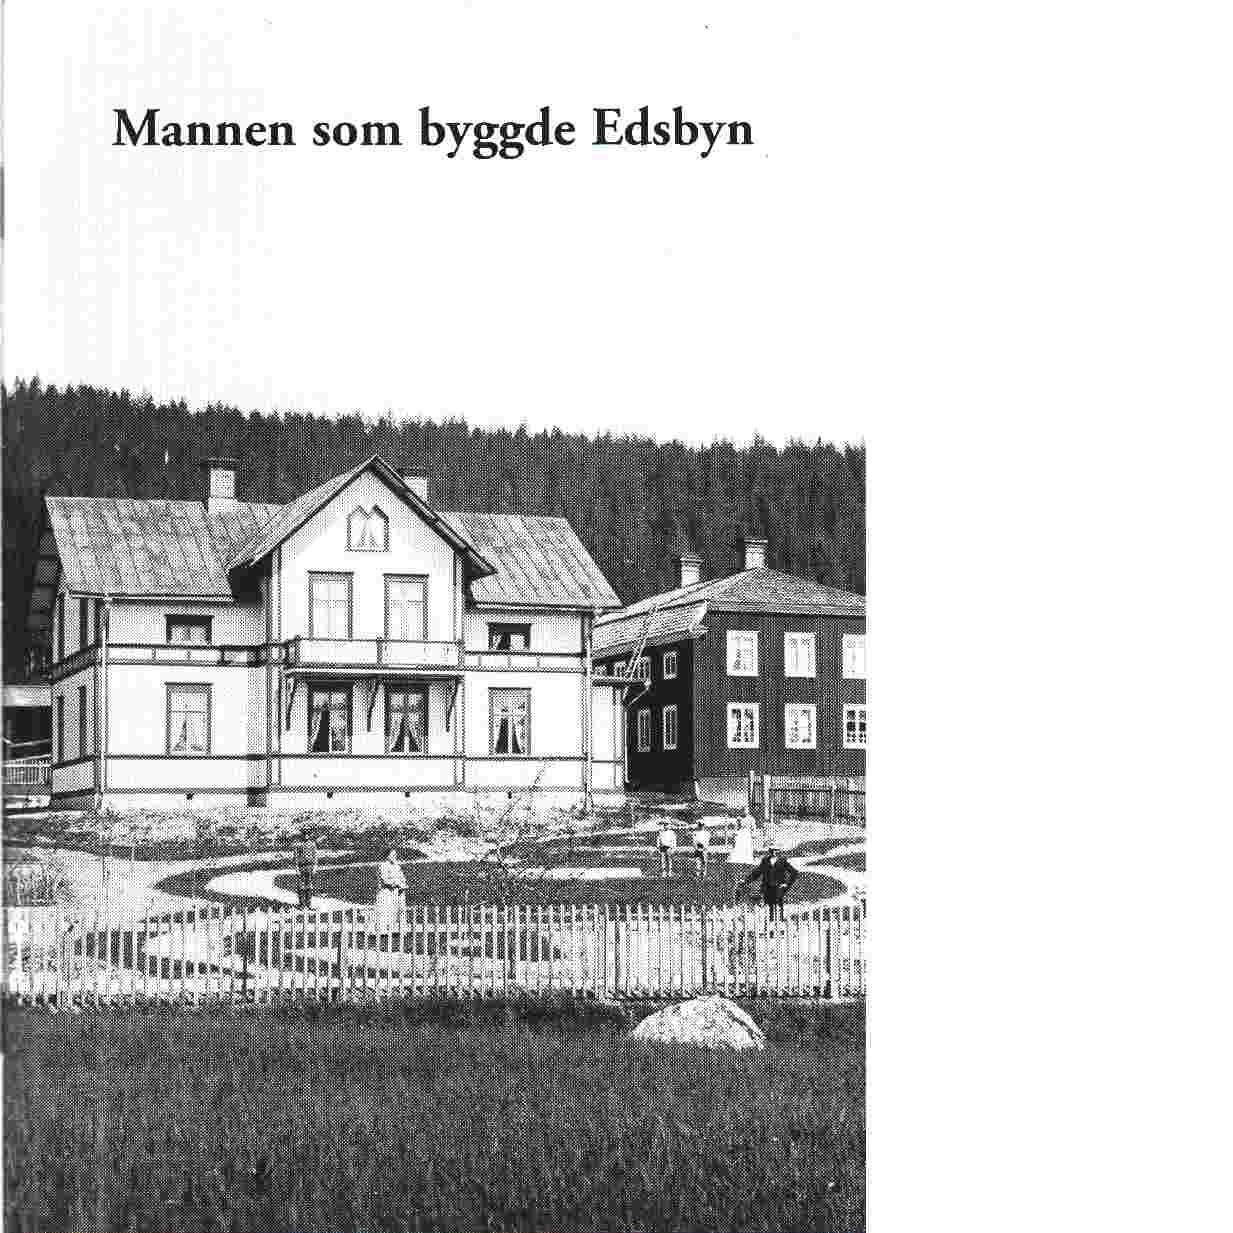 Mannen som byggde Edsbyn - Bedoire, Fredric